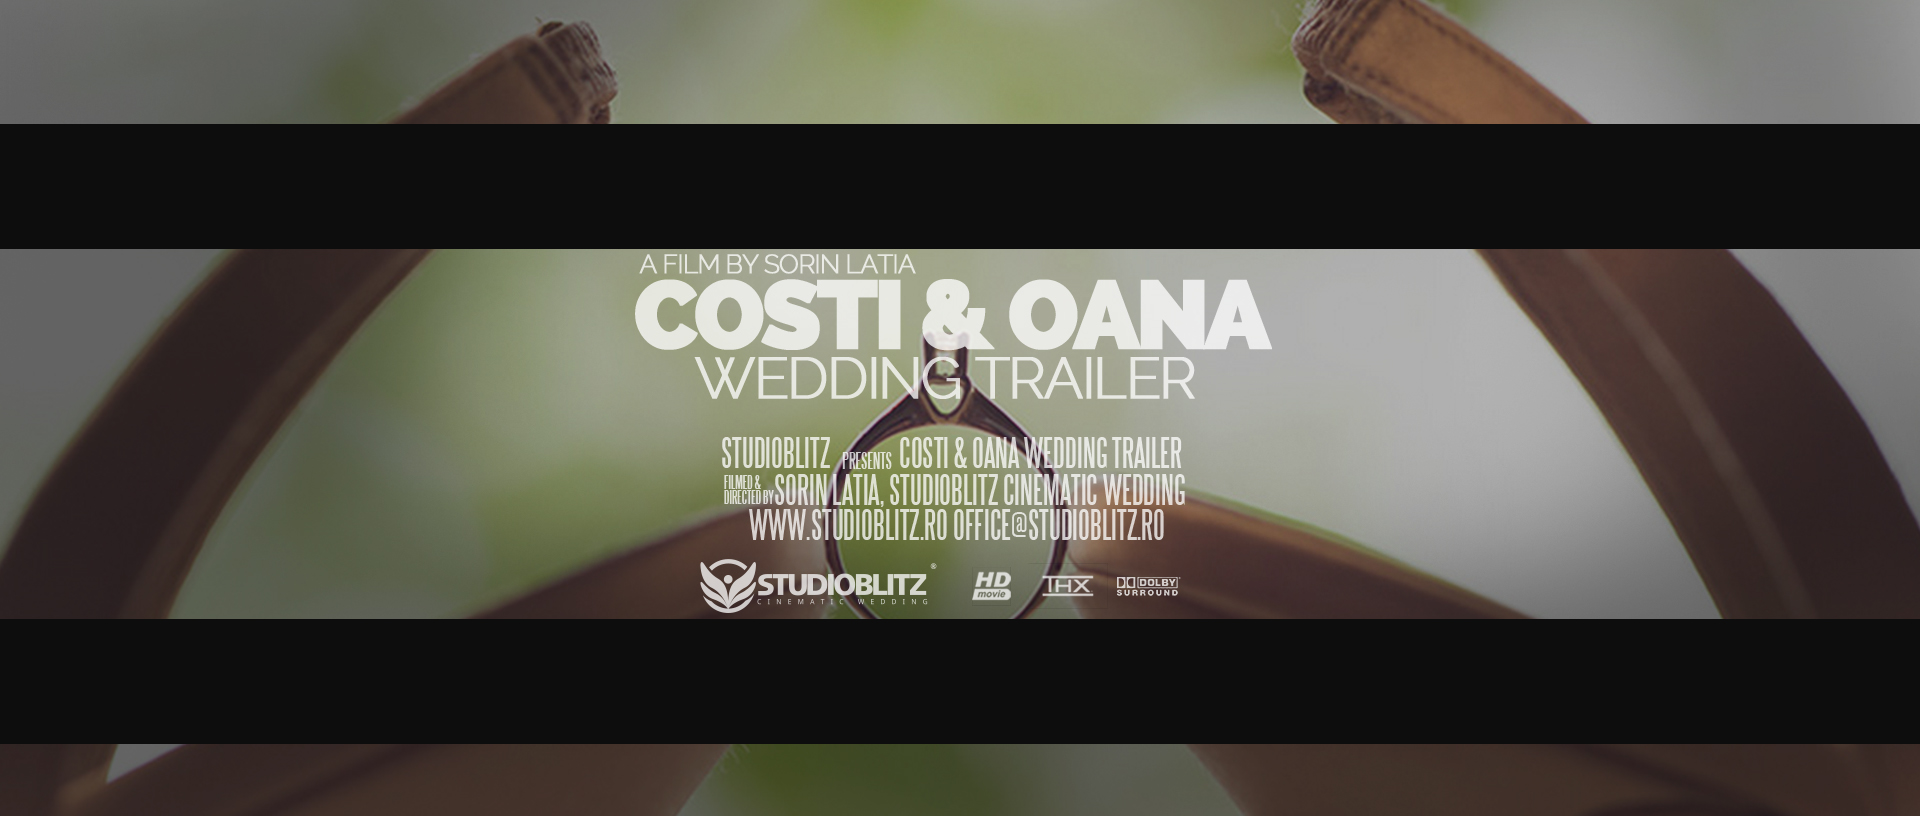 coperta-filmare-nunta-calafat-costi-oana